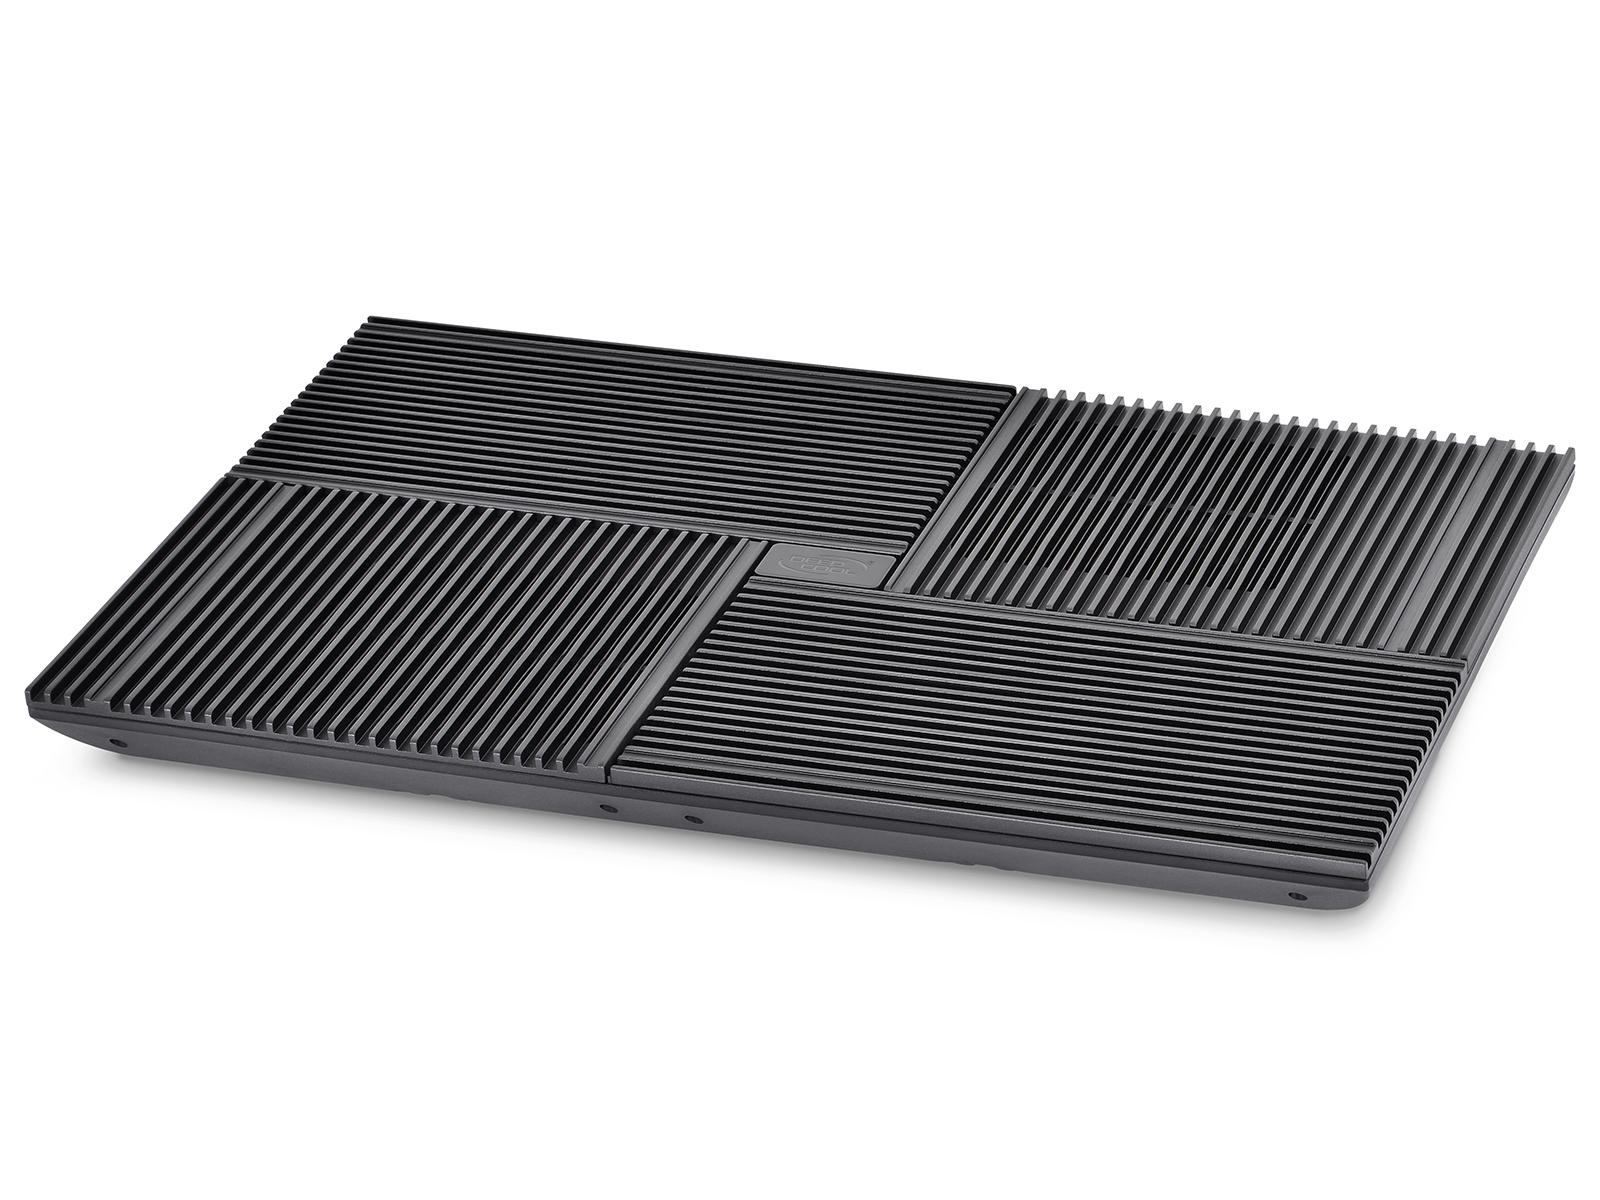 "DeepCool Multi Core X8 17"" Black notebook cooling pad"